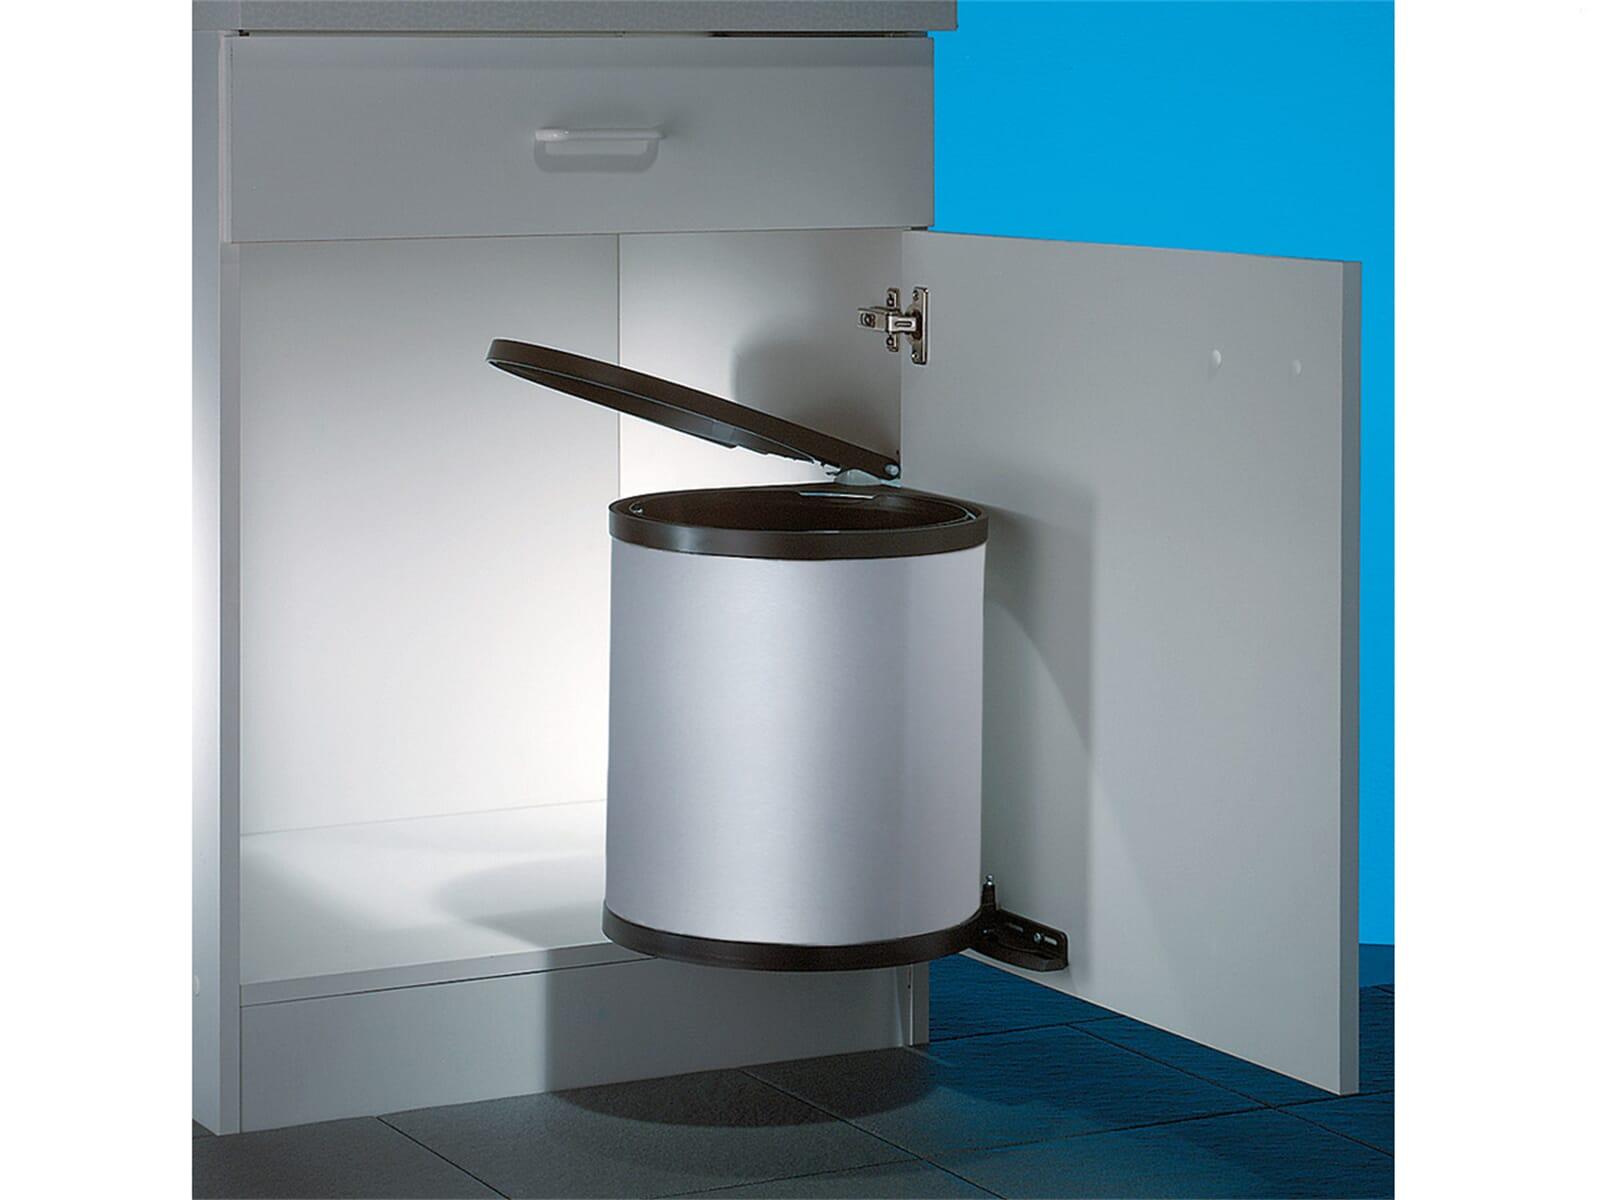 naber rondo 3 silber einbau abfallsammler f r 34 90 eur. Black Bedroom Furniture Sets. Home Design Ideas